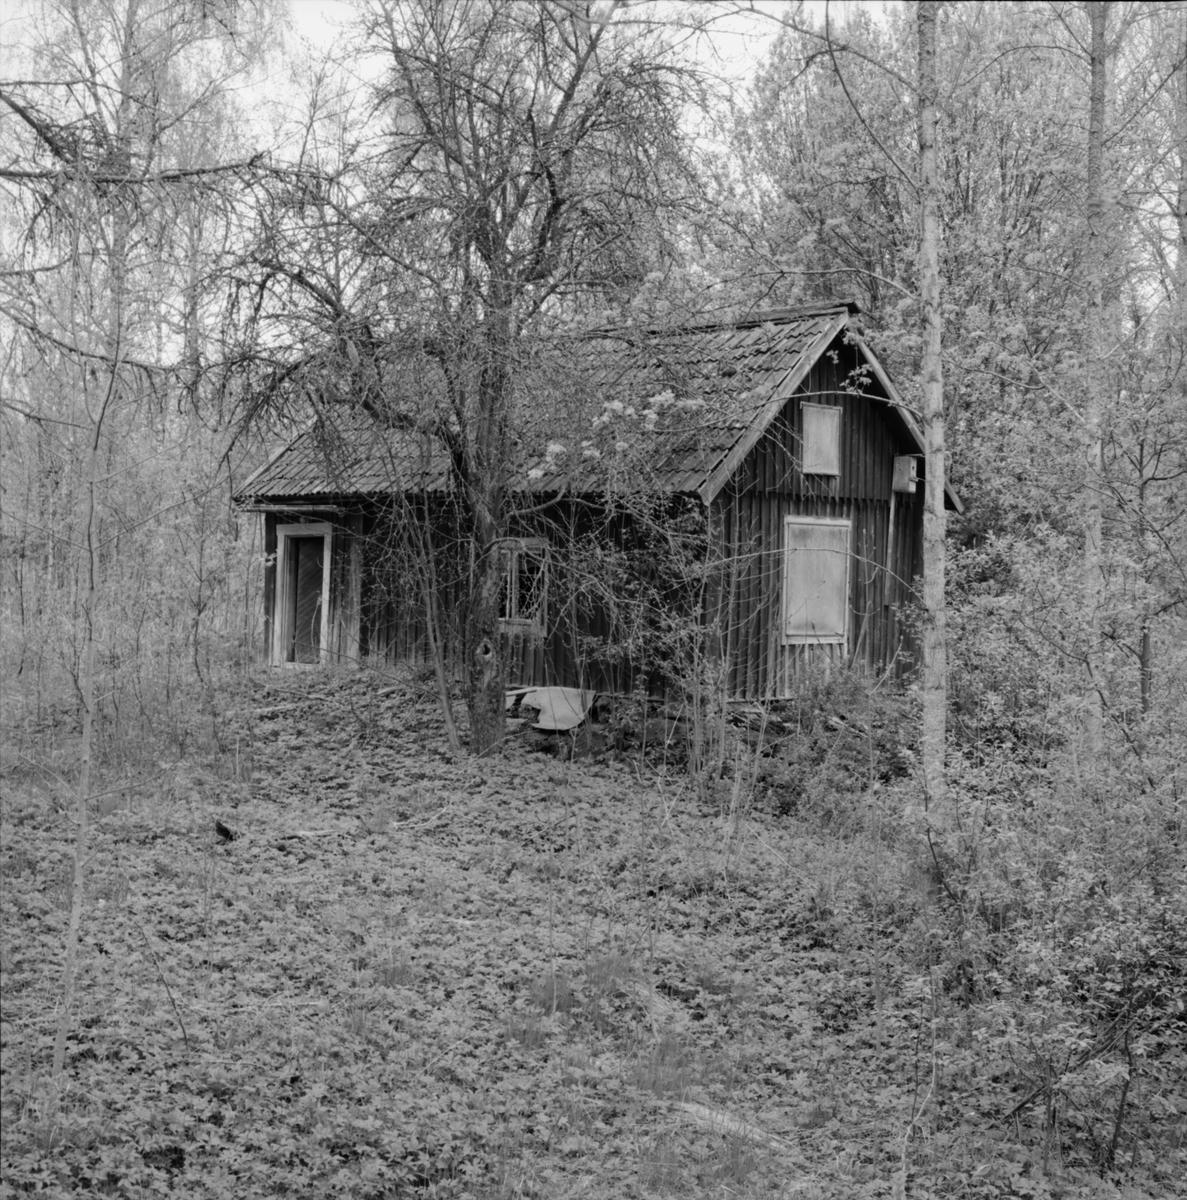 Bostadshus, torp, Dannemora Gruvor AB, Dannemora, Uppland maj 1991